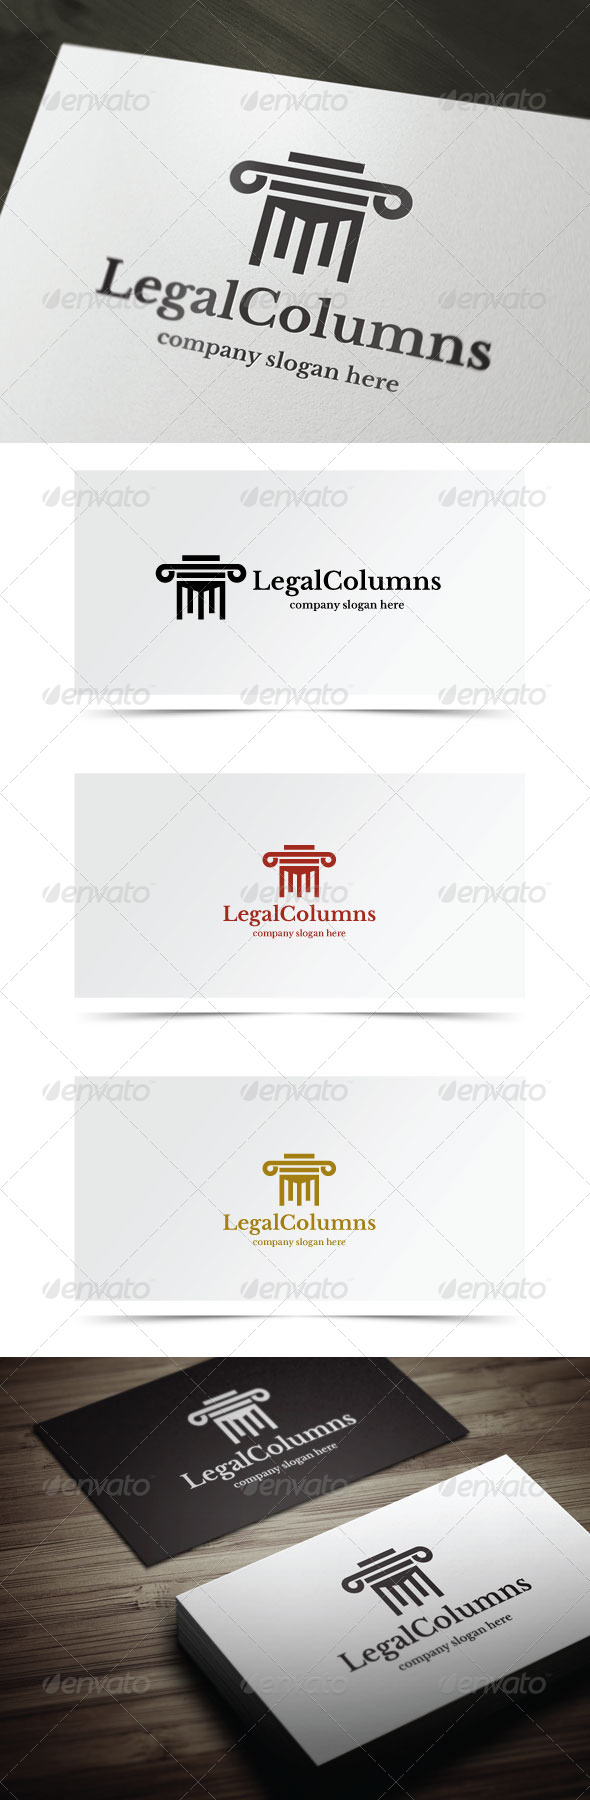 Legal Columns - Objects Logo Templates